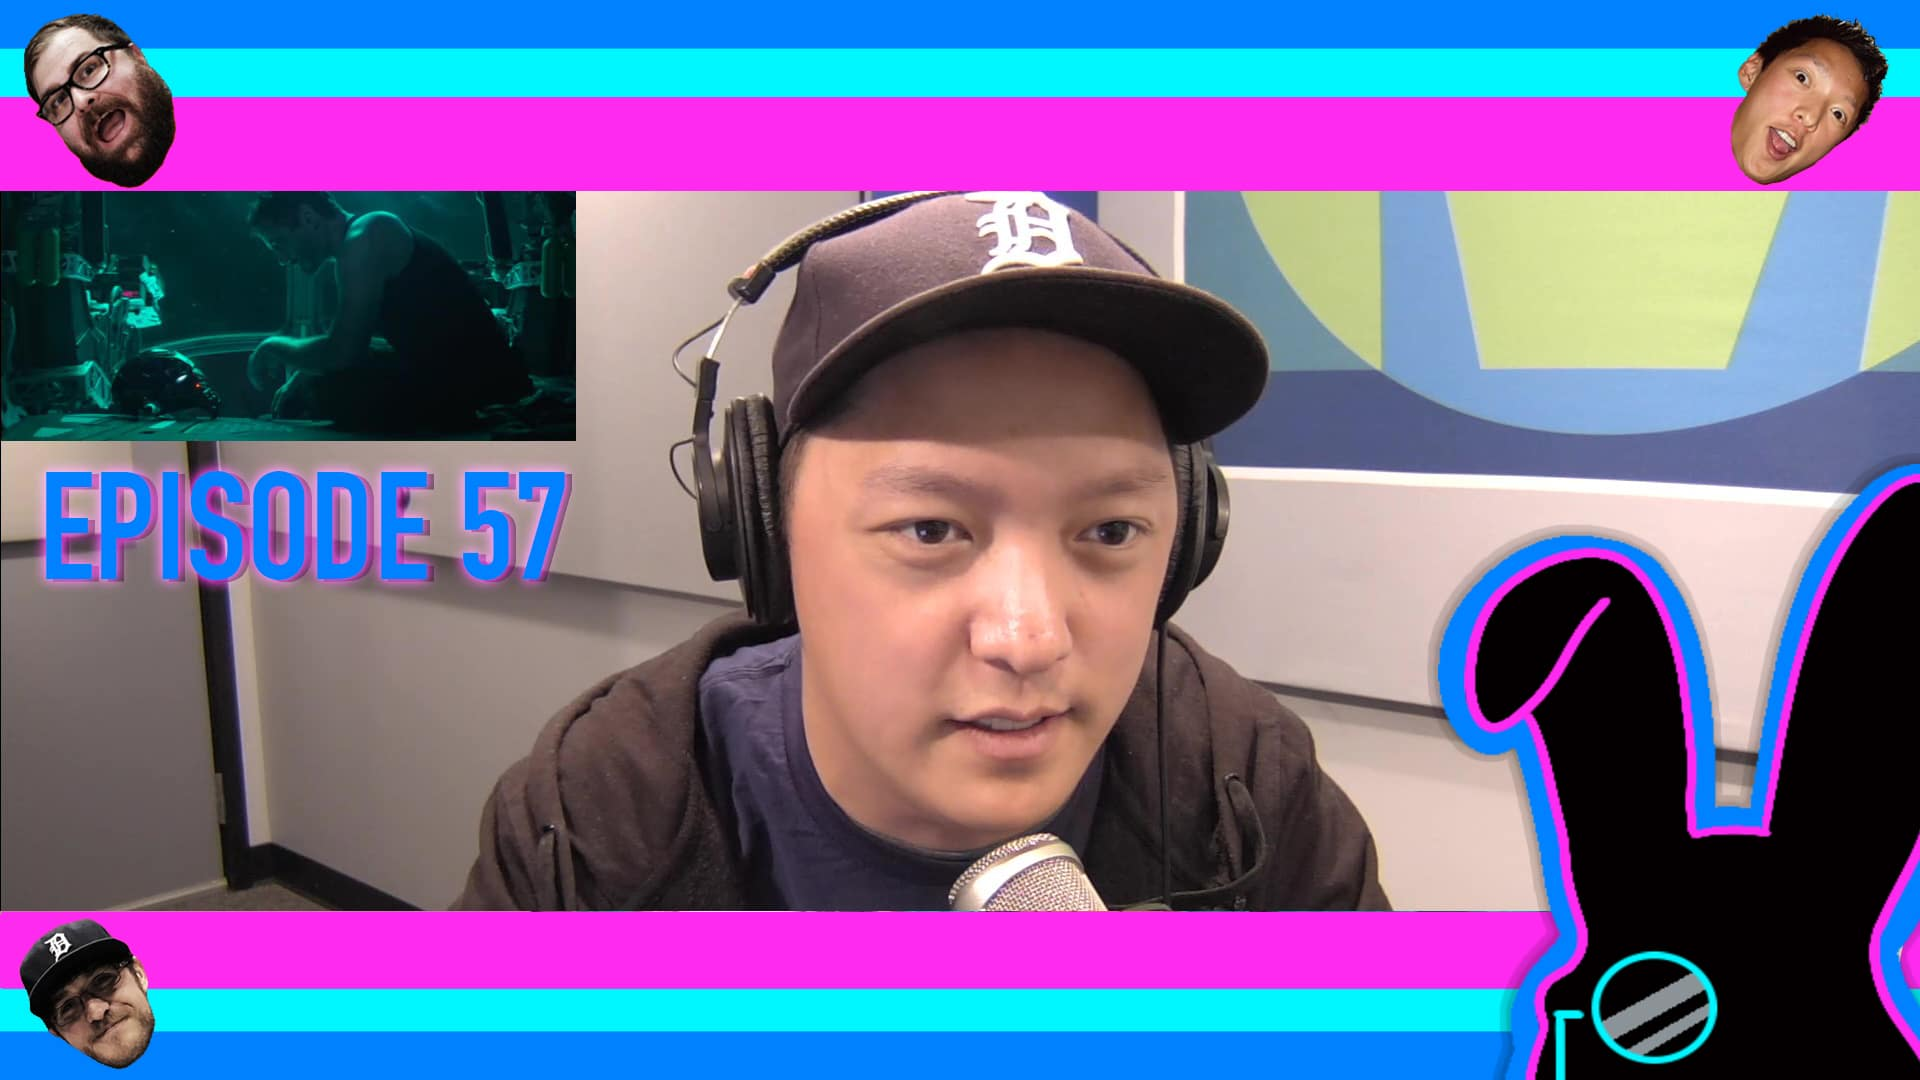 Geektainment Weekly - Episode 57